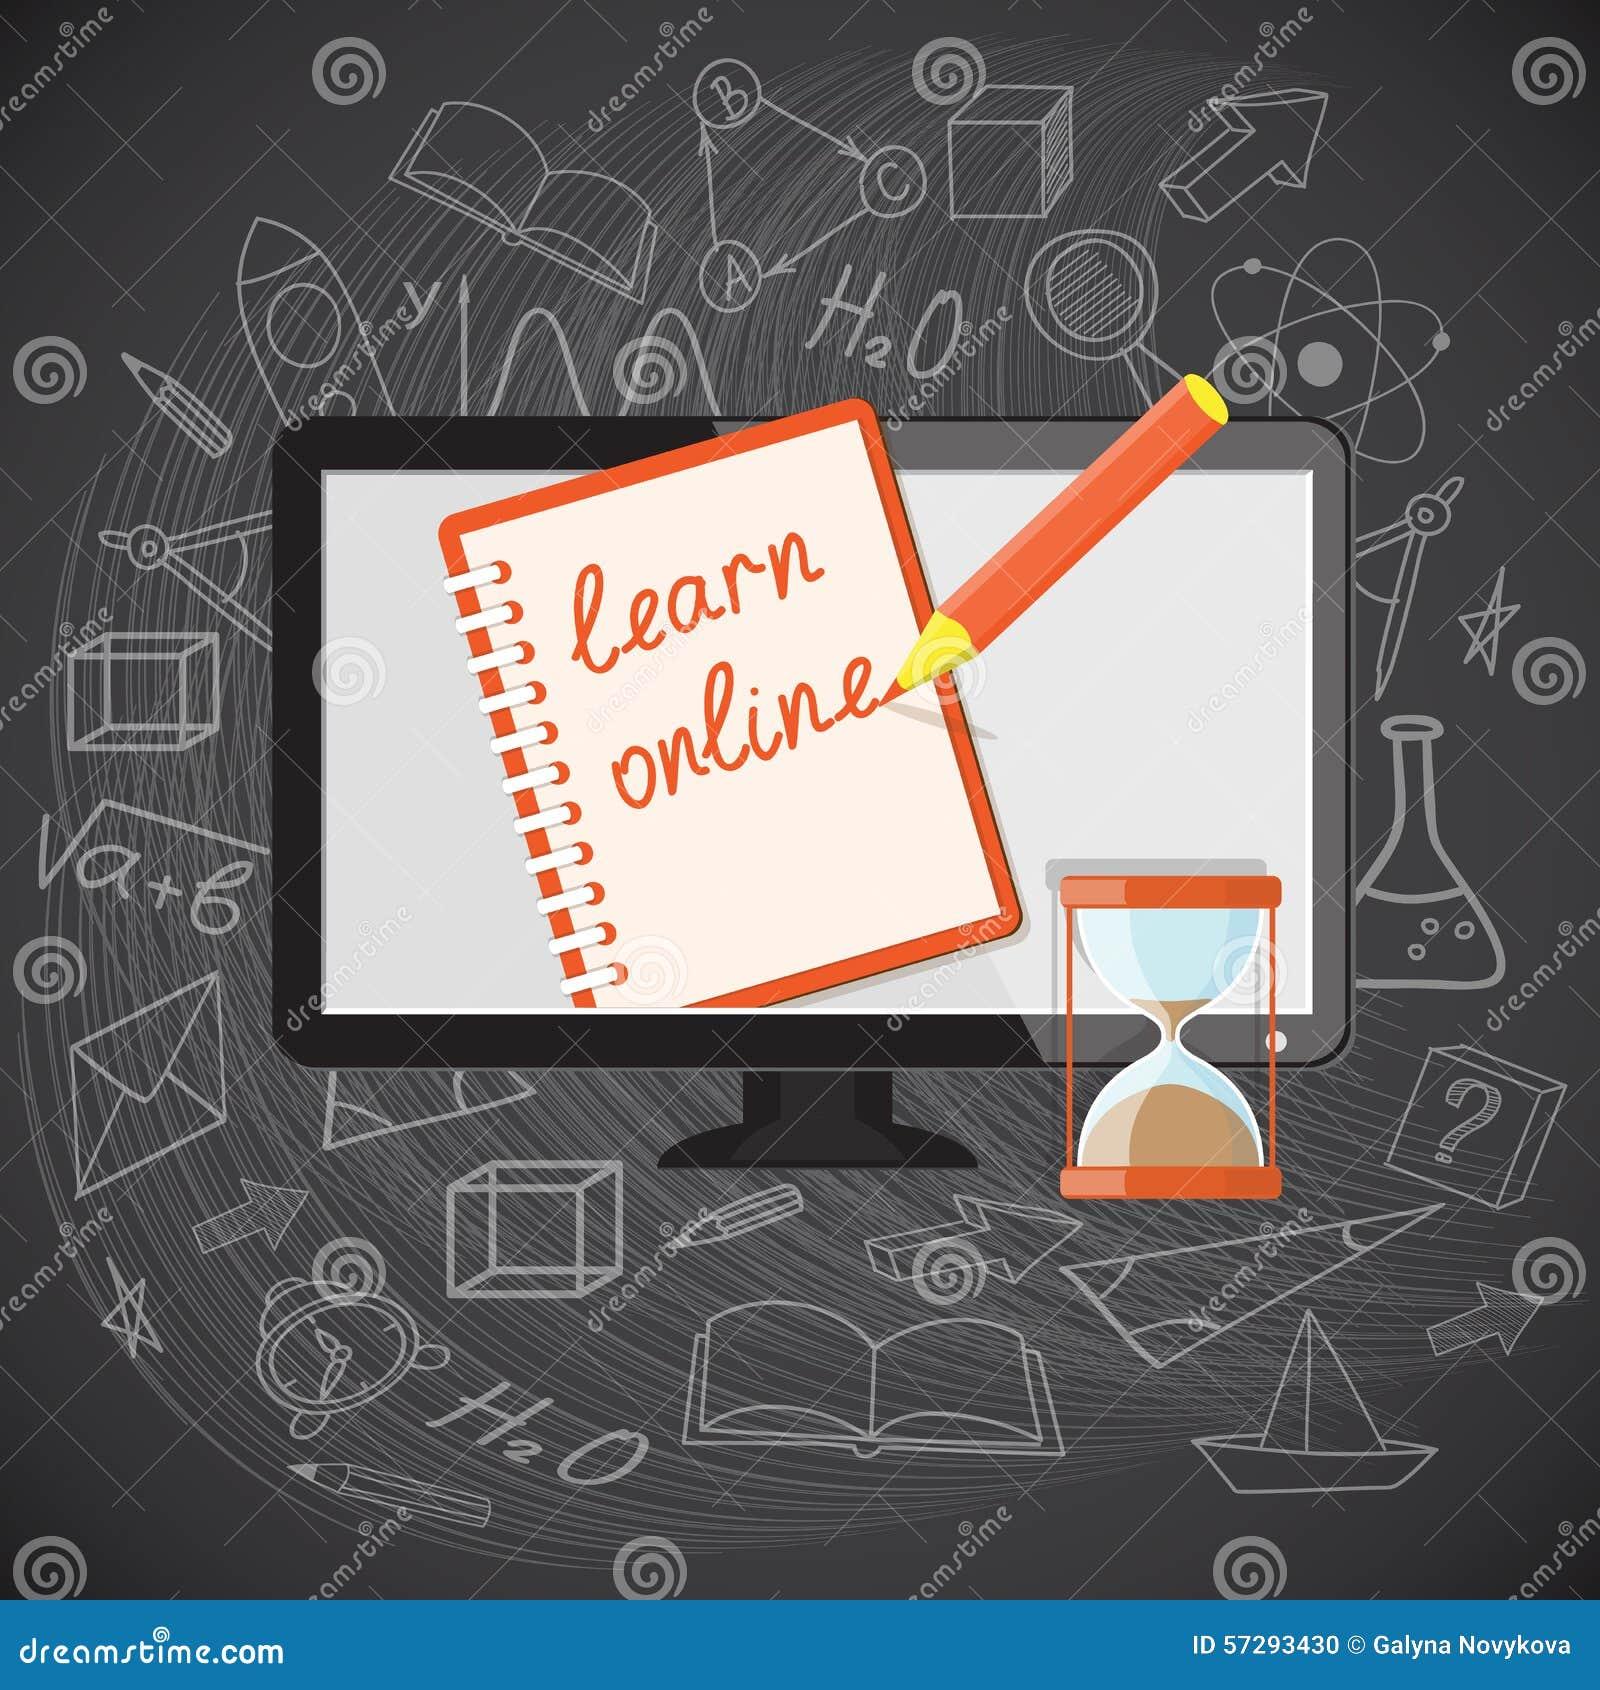 10 Great Websites To Help You Learn Web Development Online ...